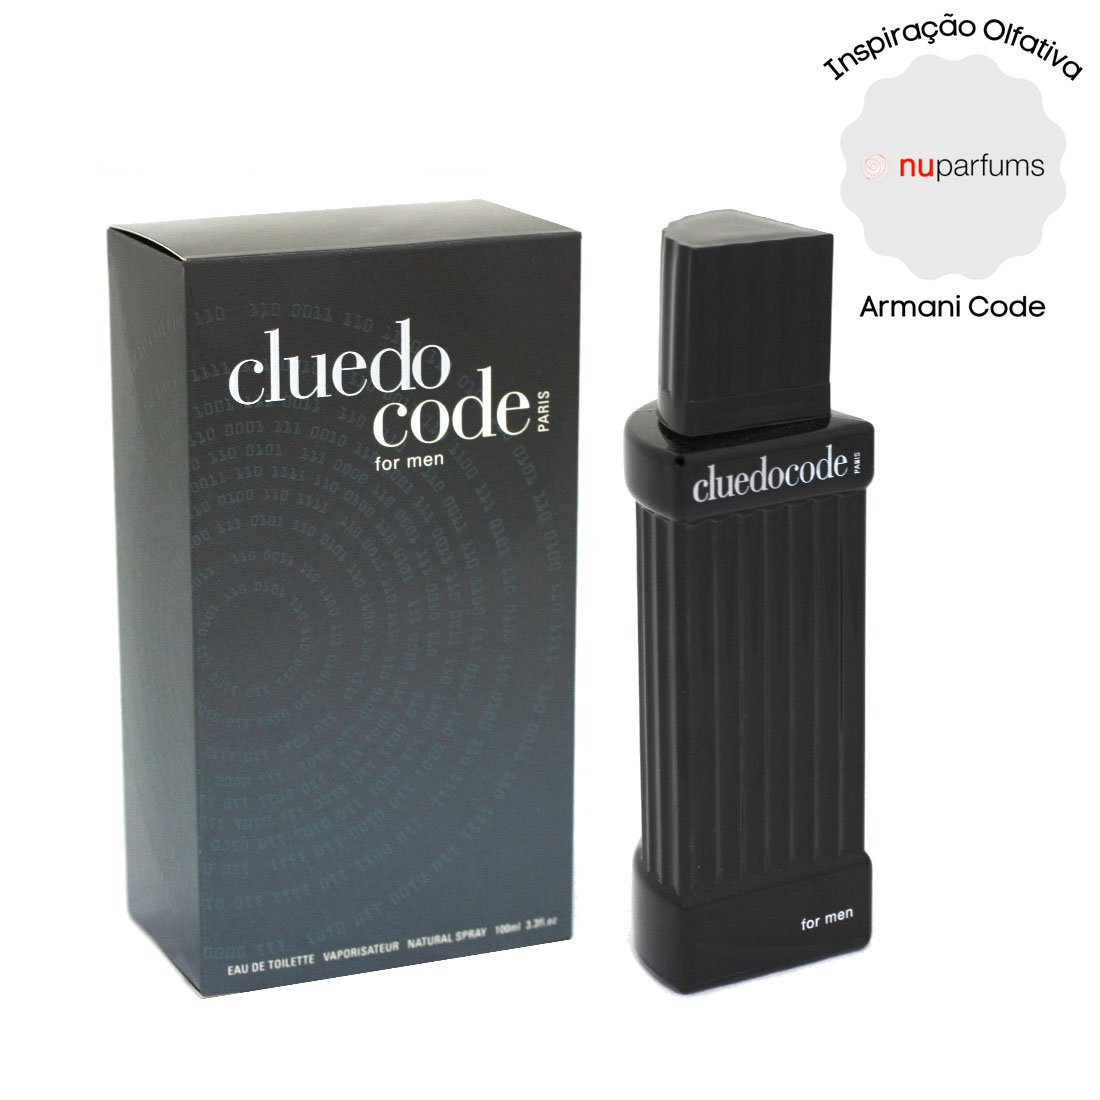 perfume nuparfums cluedo code for men masculino edt 100ml armani code 51319 2000 203826 1